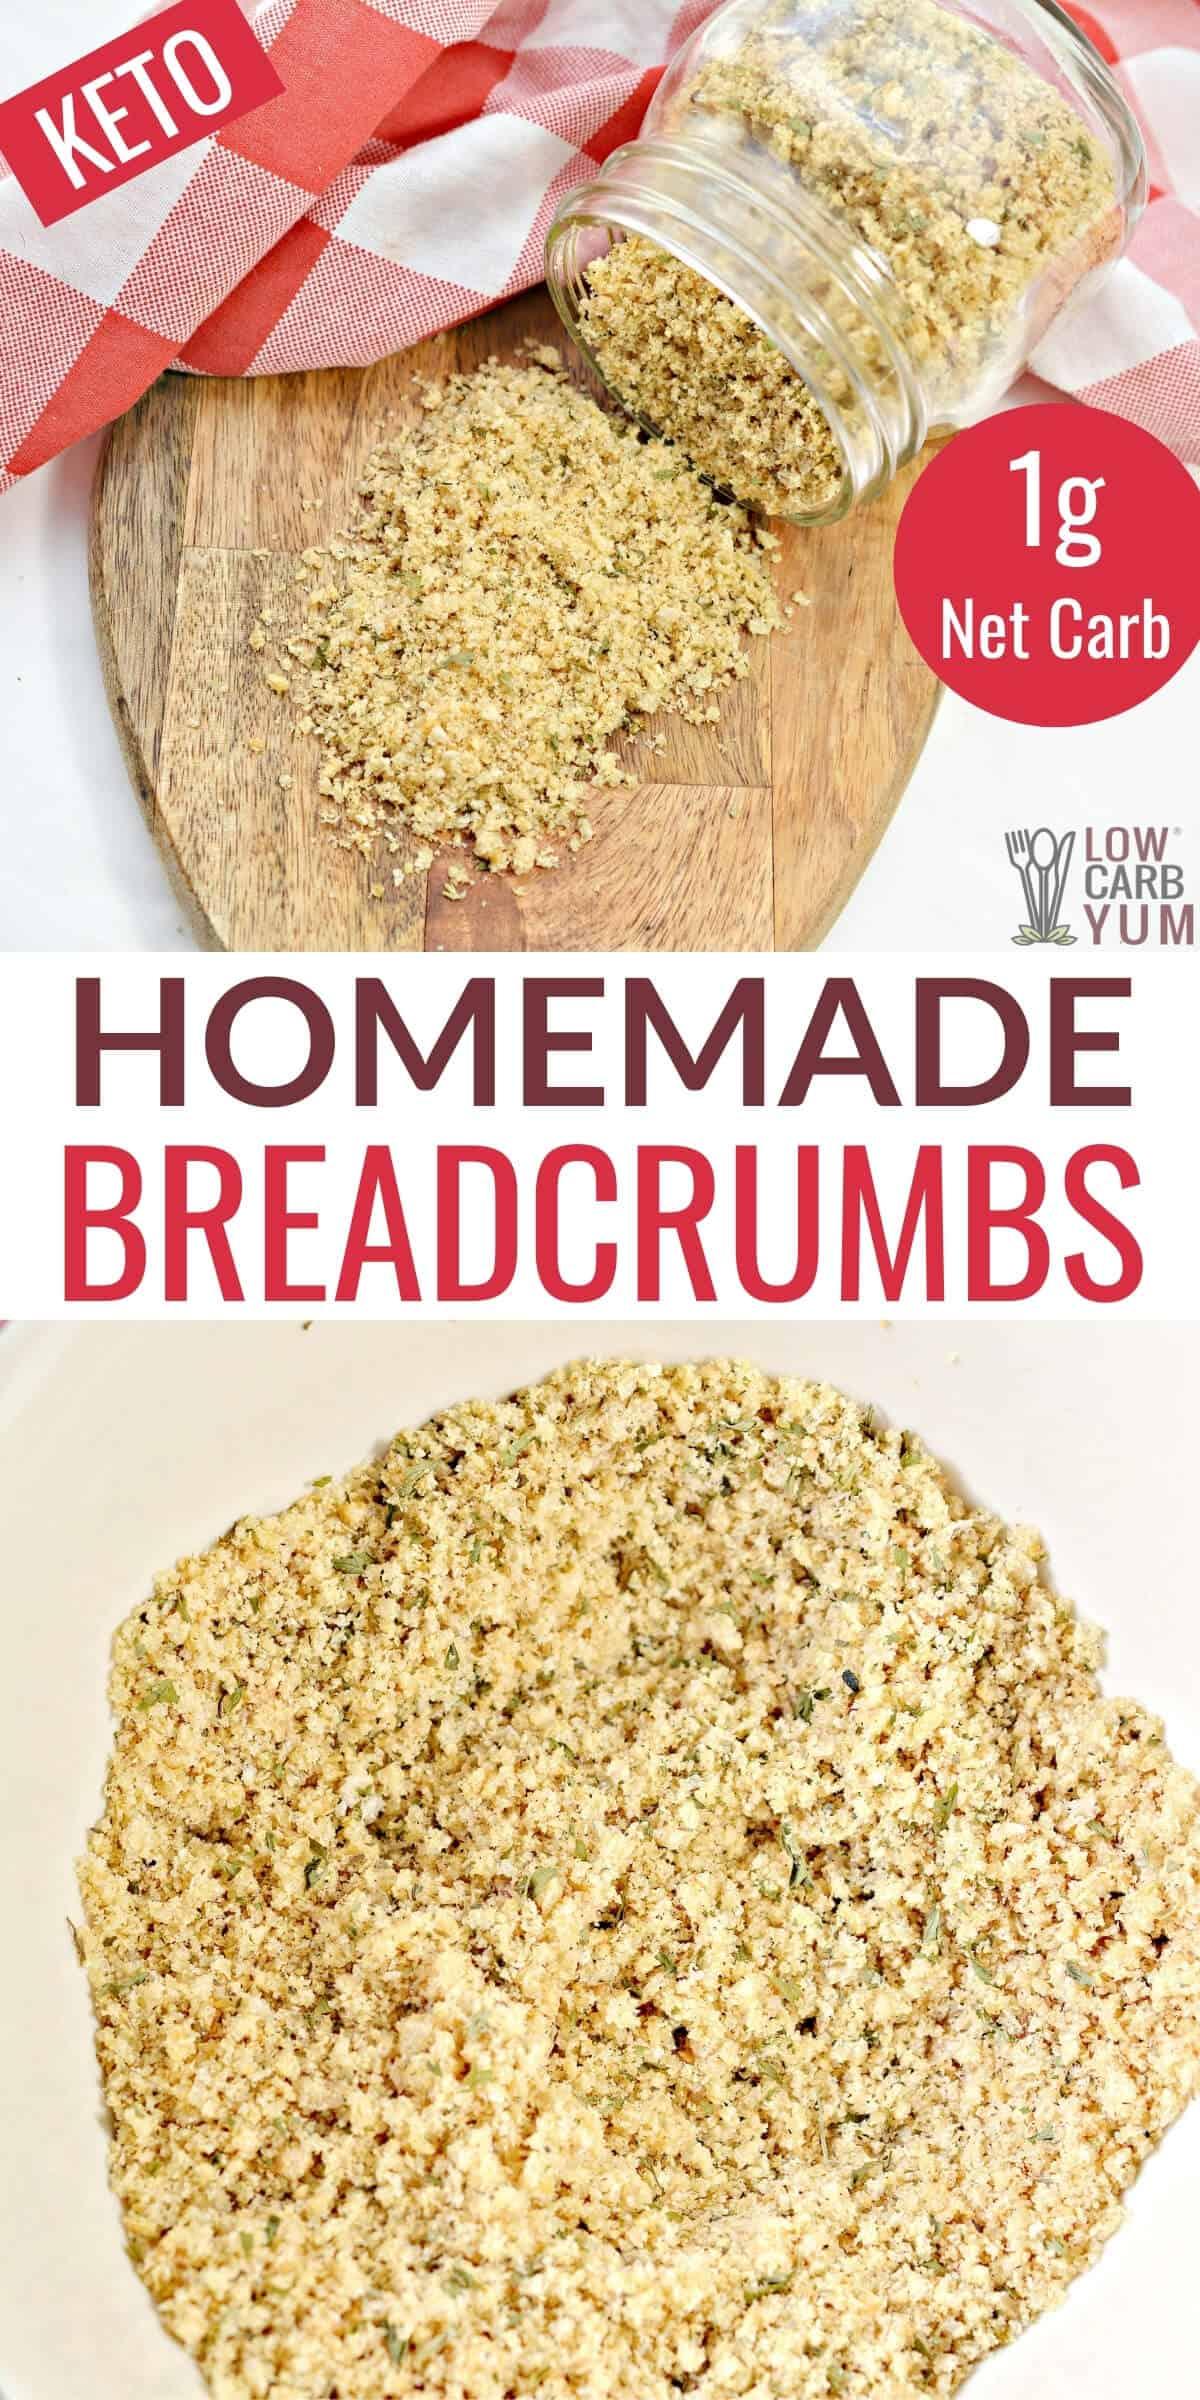 homemade breadcrumbs keto recipe pinterest image